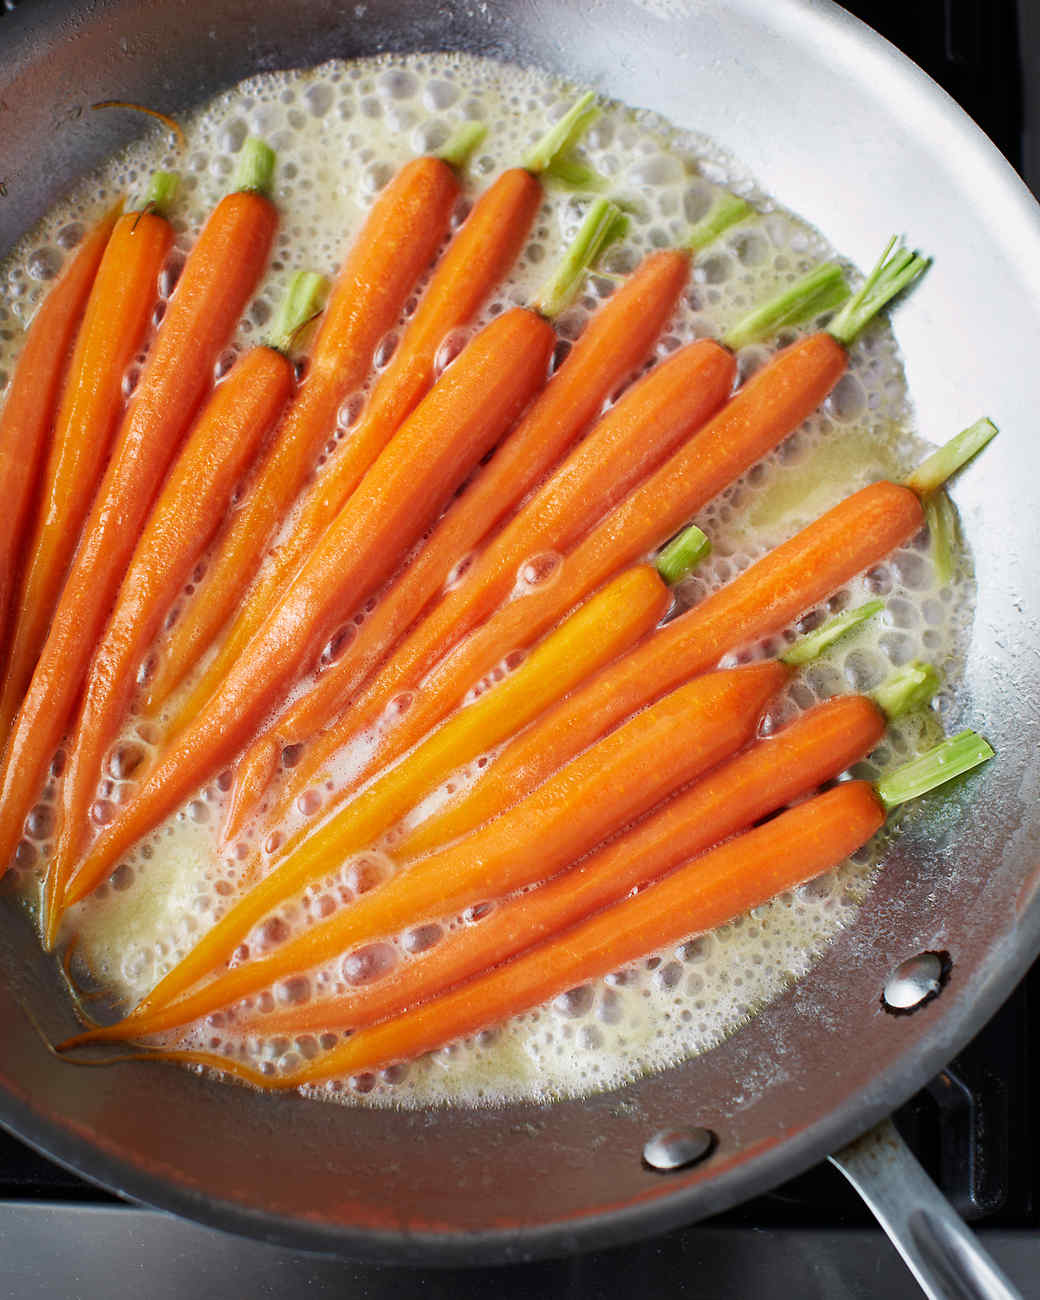 msl-kitchen-carrots-0224-md110059.jpg